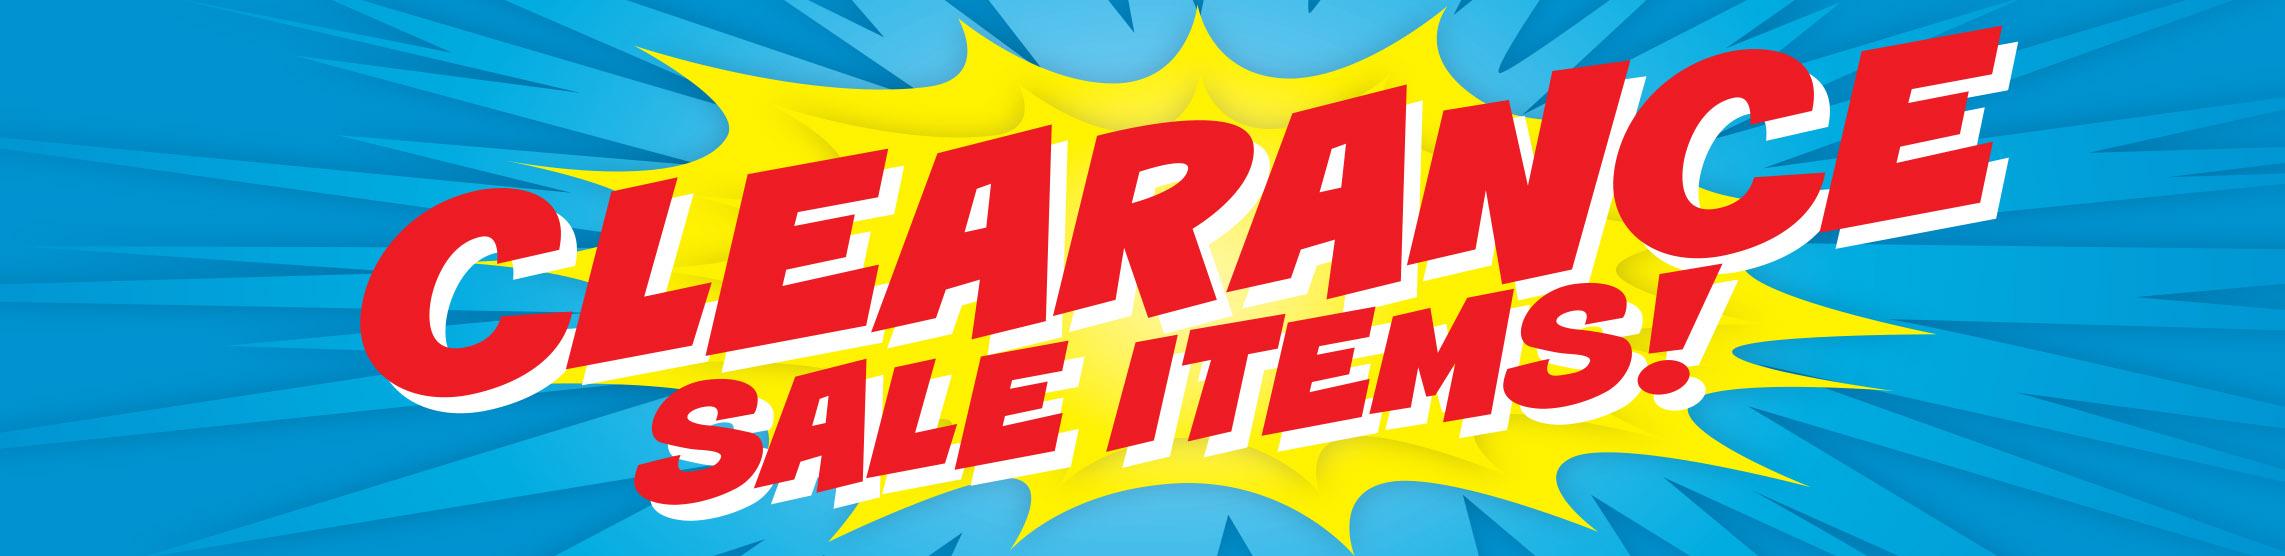 category-heading-clearance-sale-items.jpg